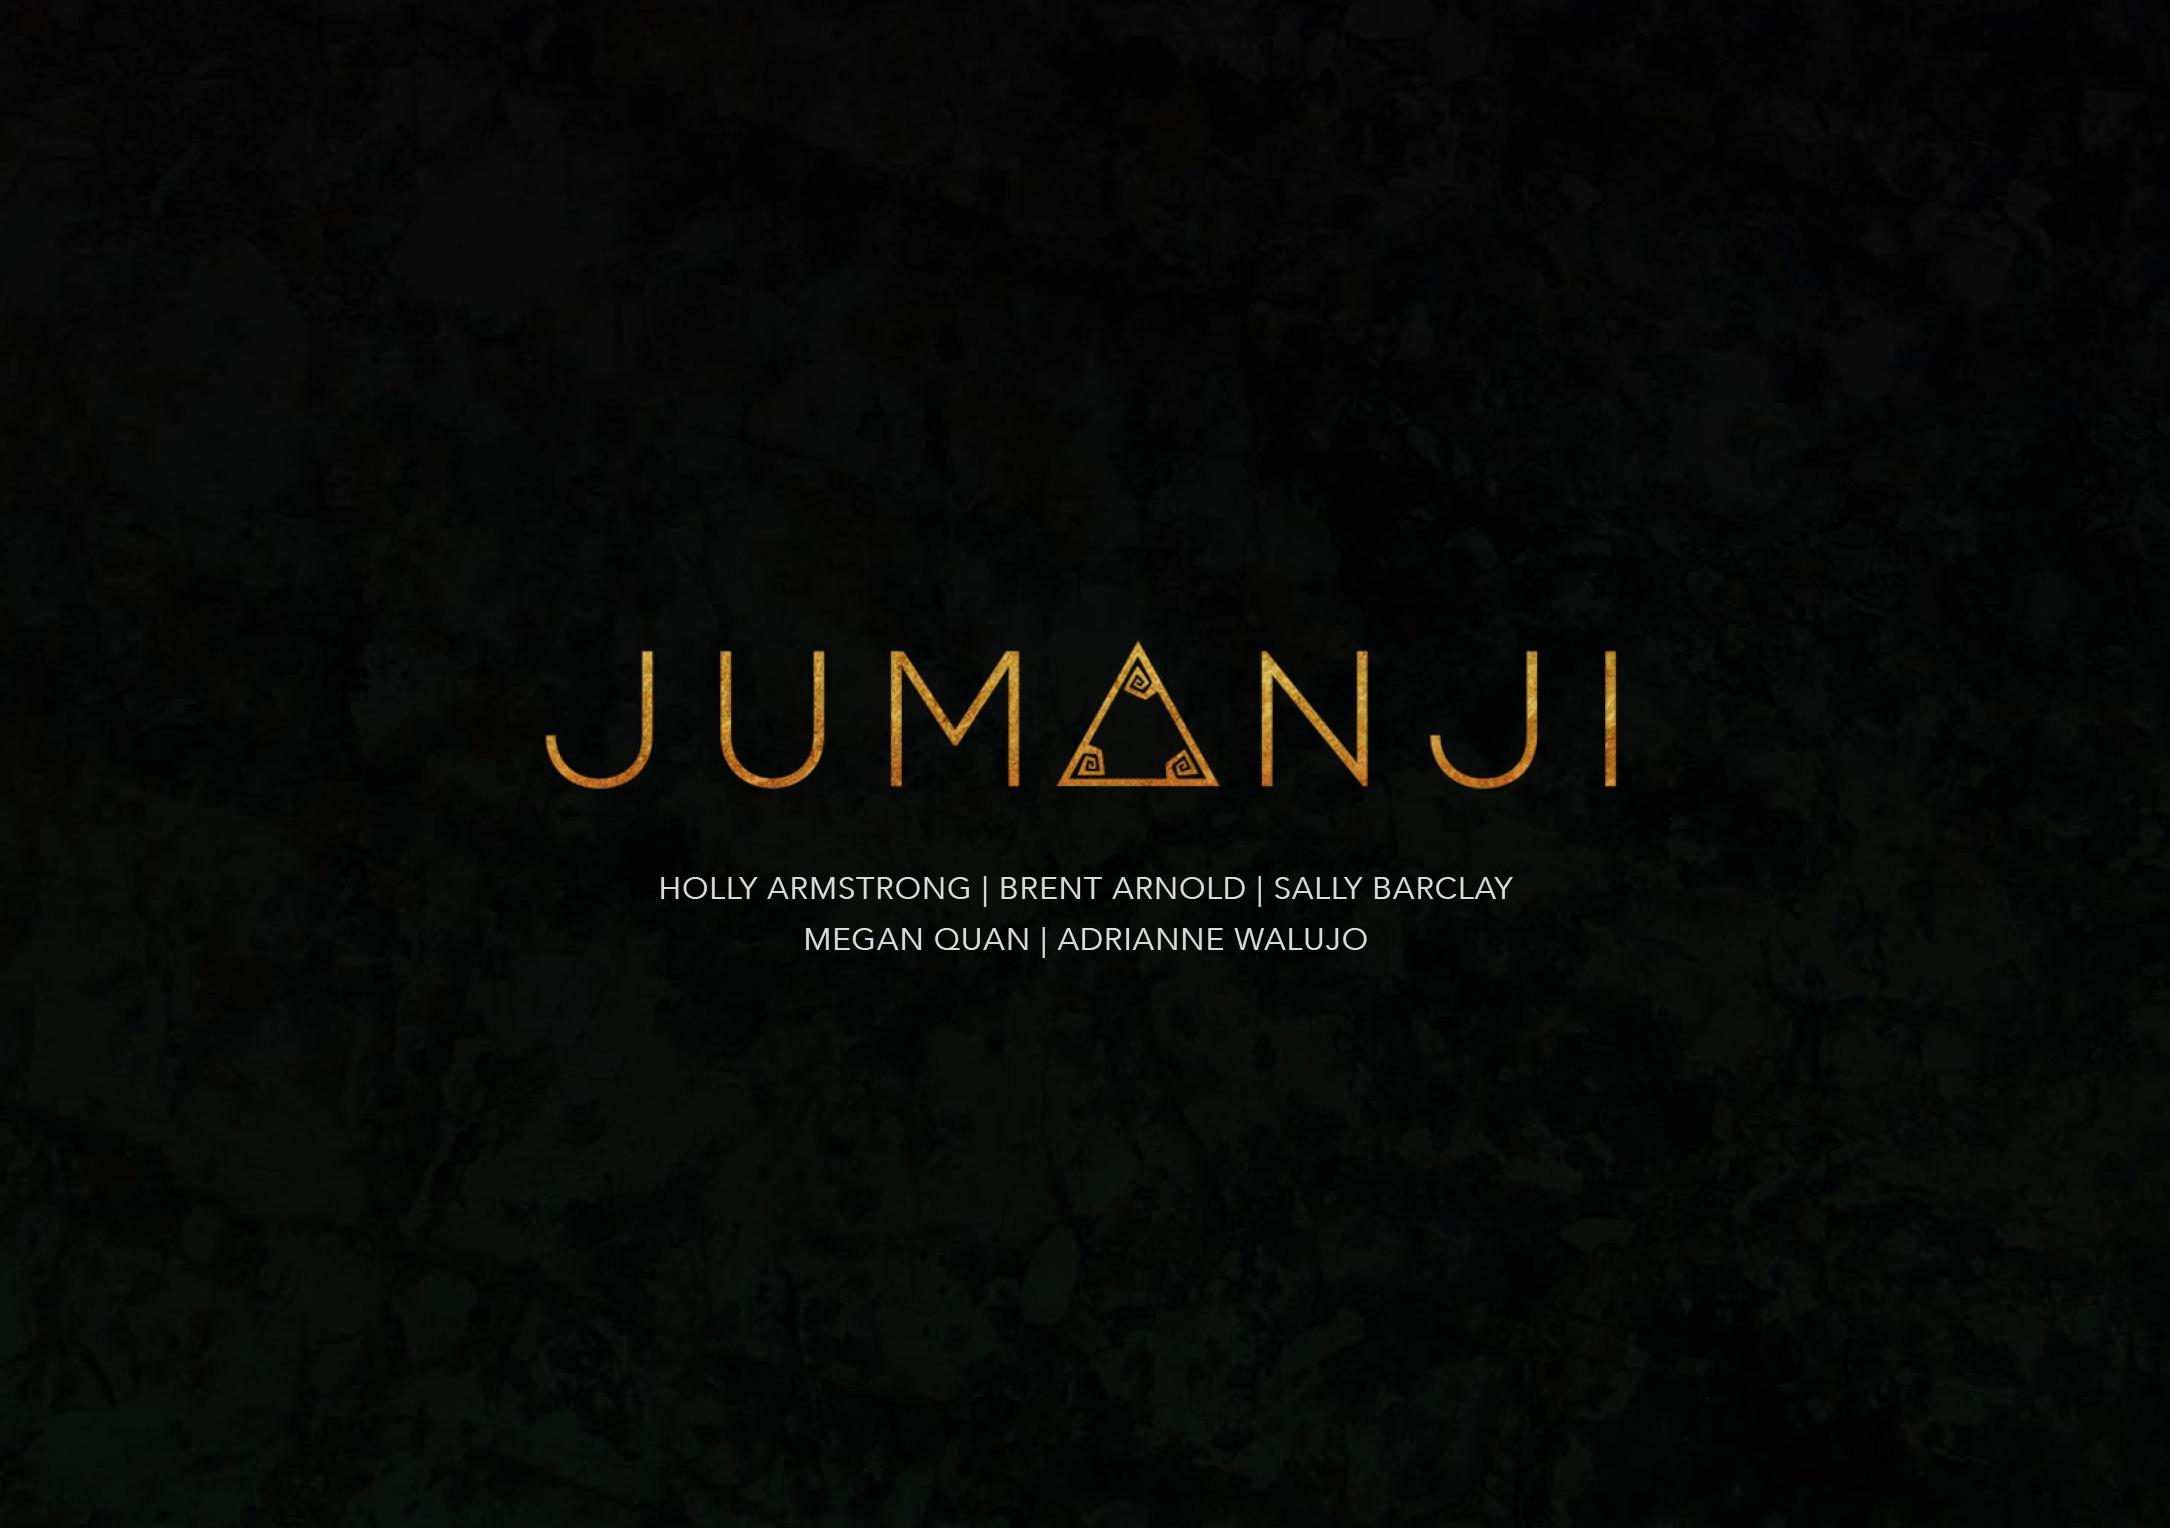 Jumanji - Title